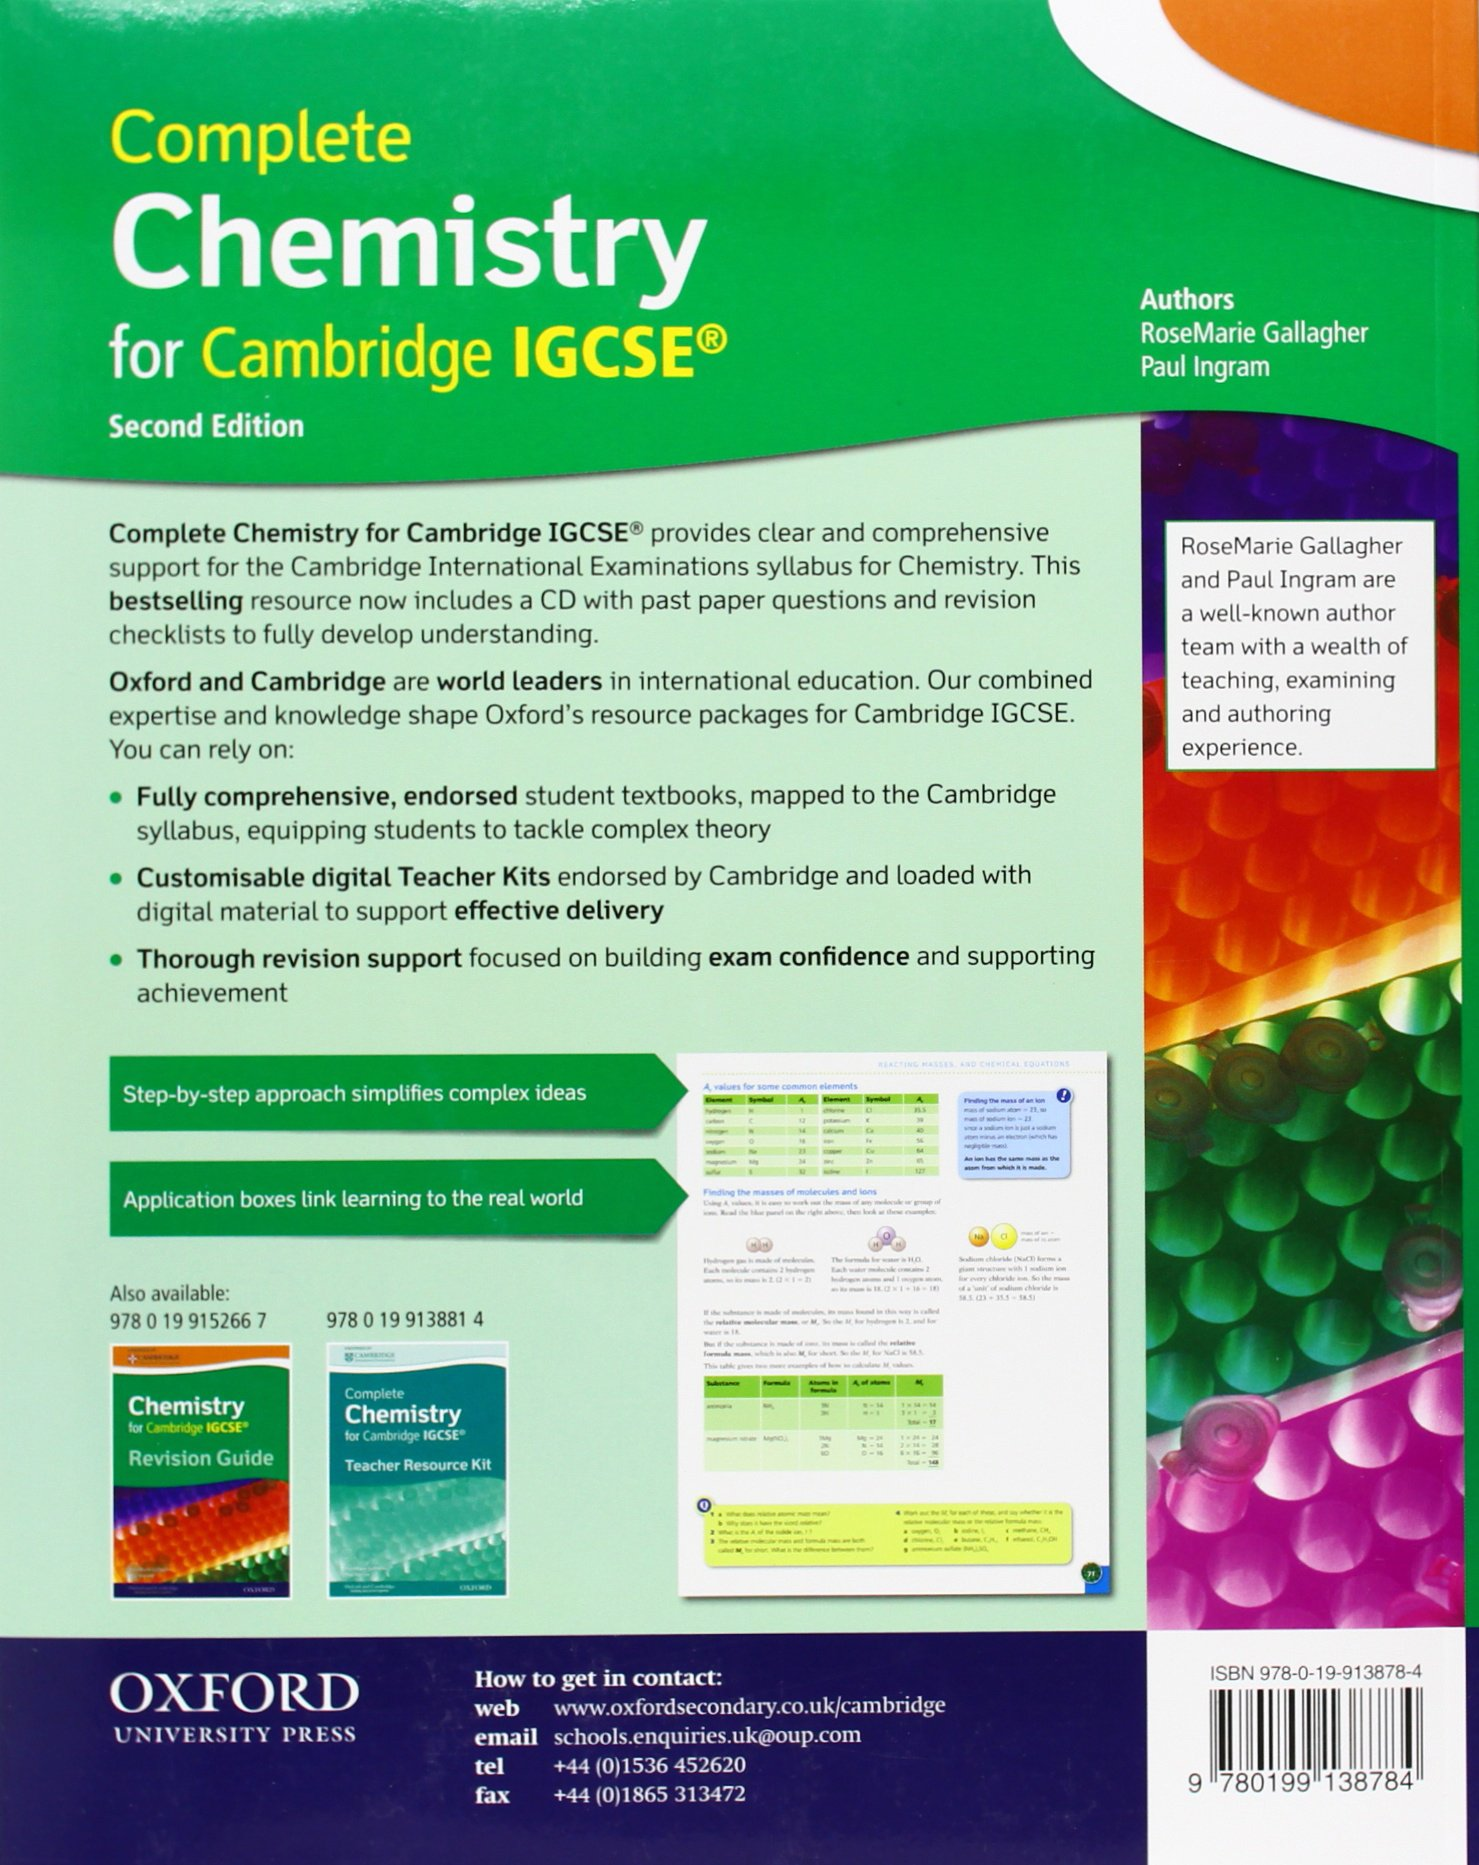 Amazon complete chemistry for cambridge igcserg with cd rom amazon complete chemistry for cambridge igcserg with cd rom second edition 9780199138784 ingram gallagher books fandeluxe Gallery